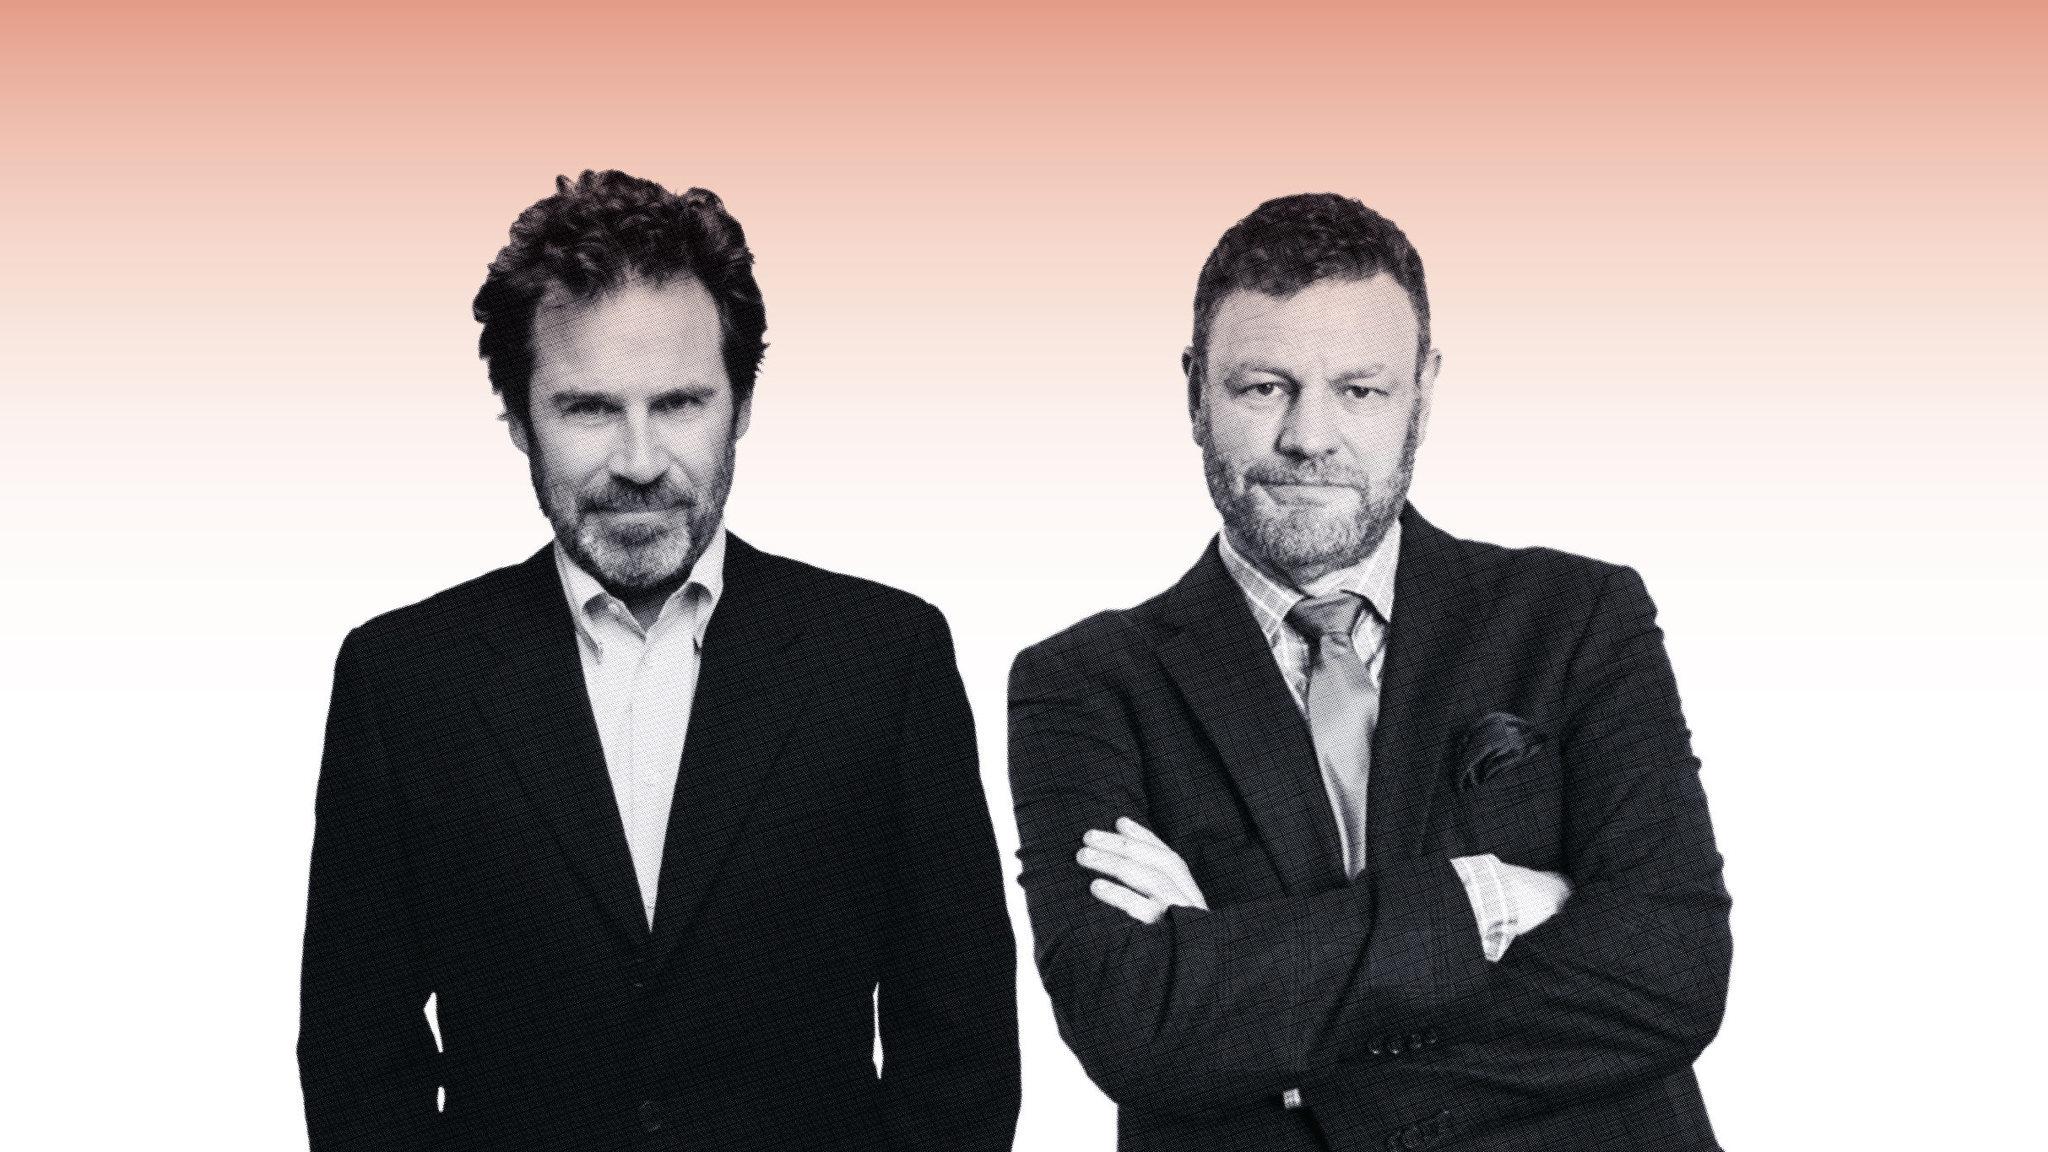 Dennis Miller, Mark Steyn bringing 'Adorable Deplorable' comedy show to Syracuse